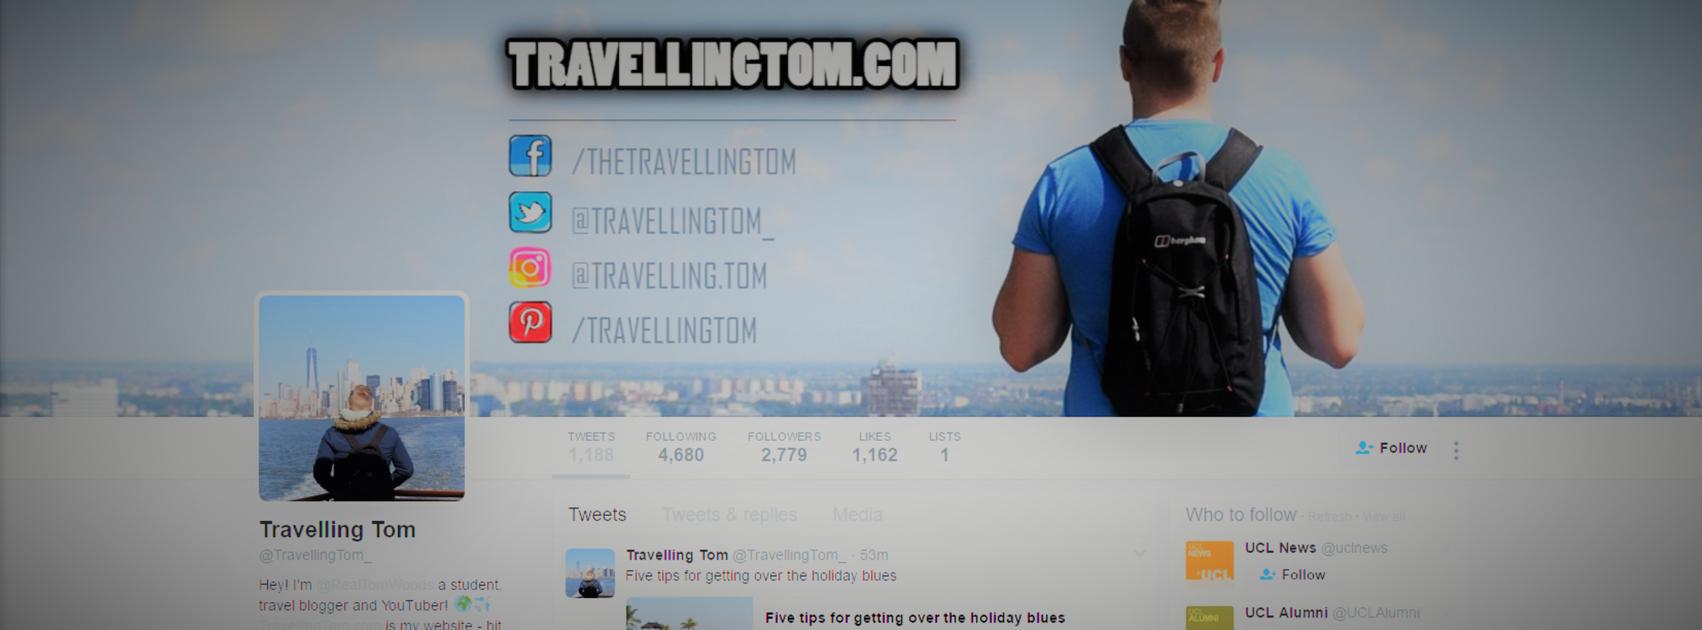 Travelling Tom